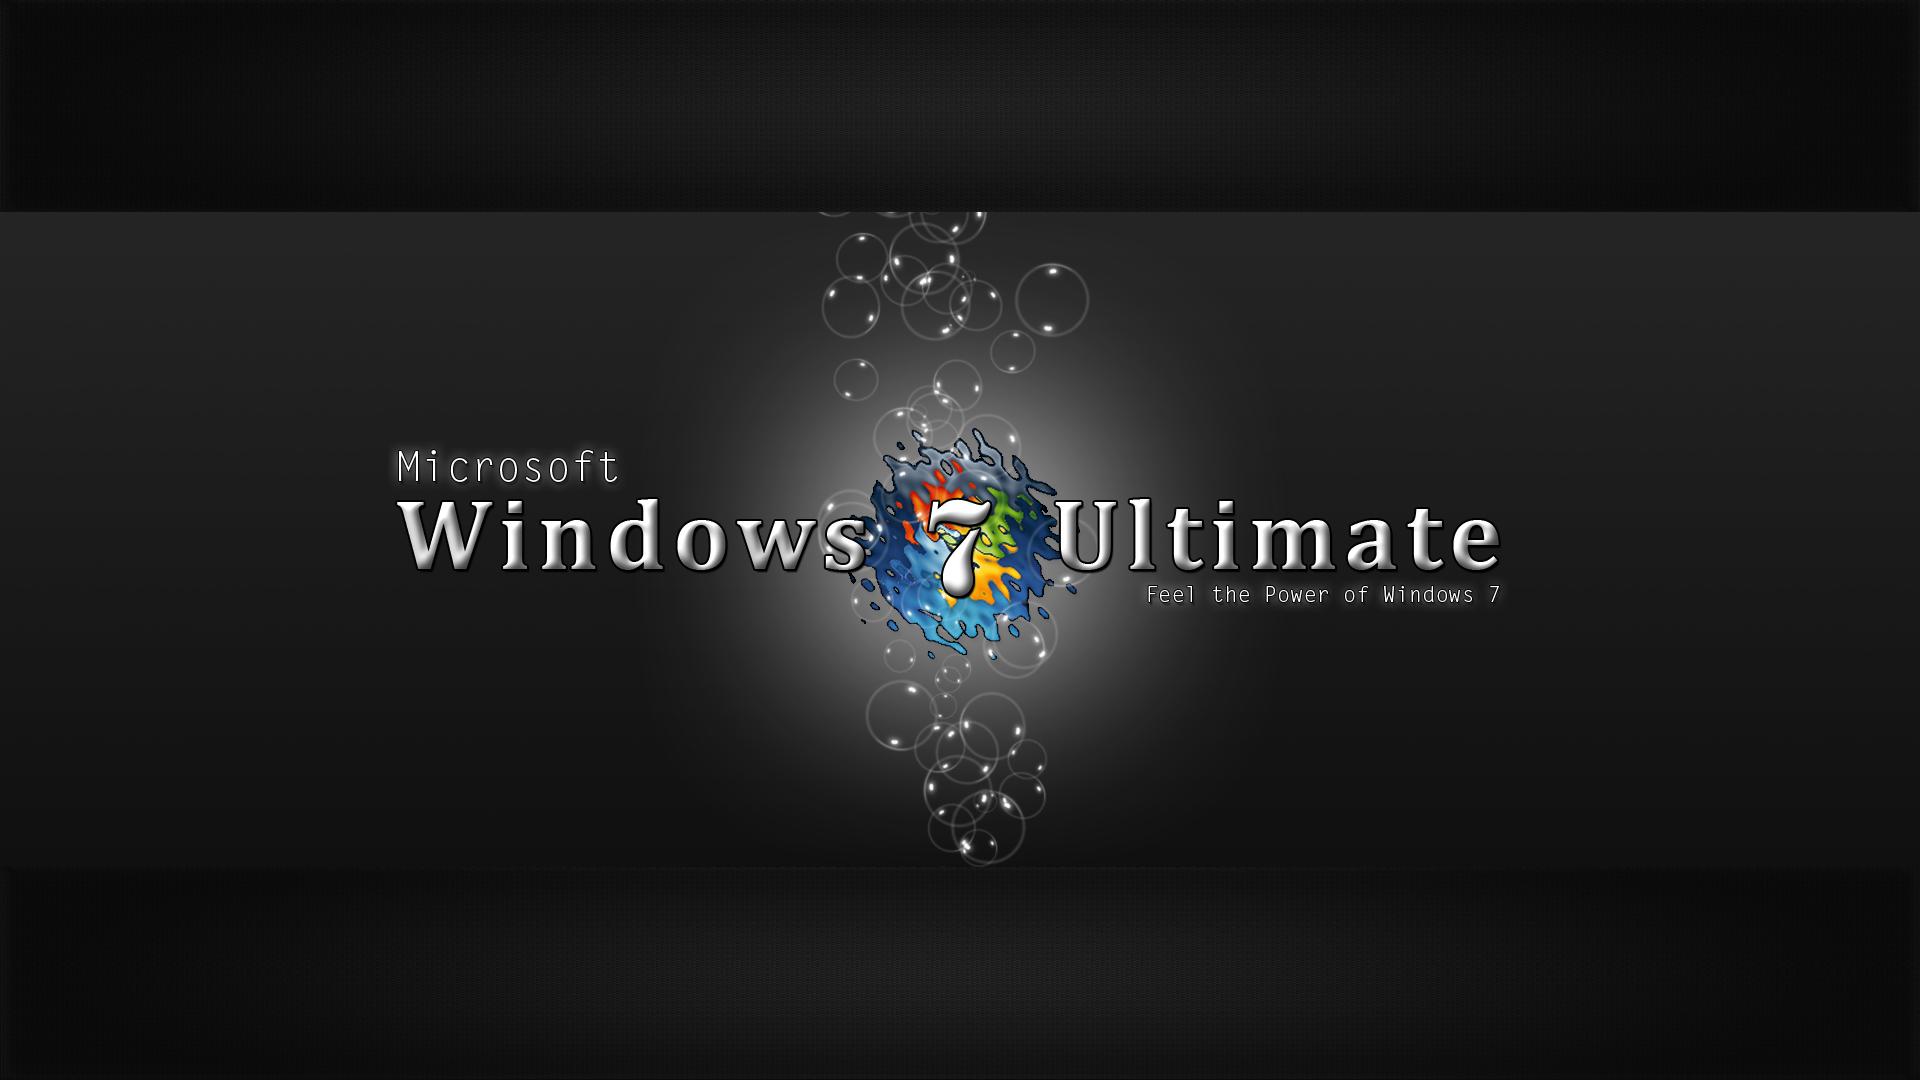 Windows 7 Ultimate Wallpaper Hd Black   1379829 1920x1080